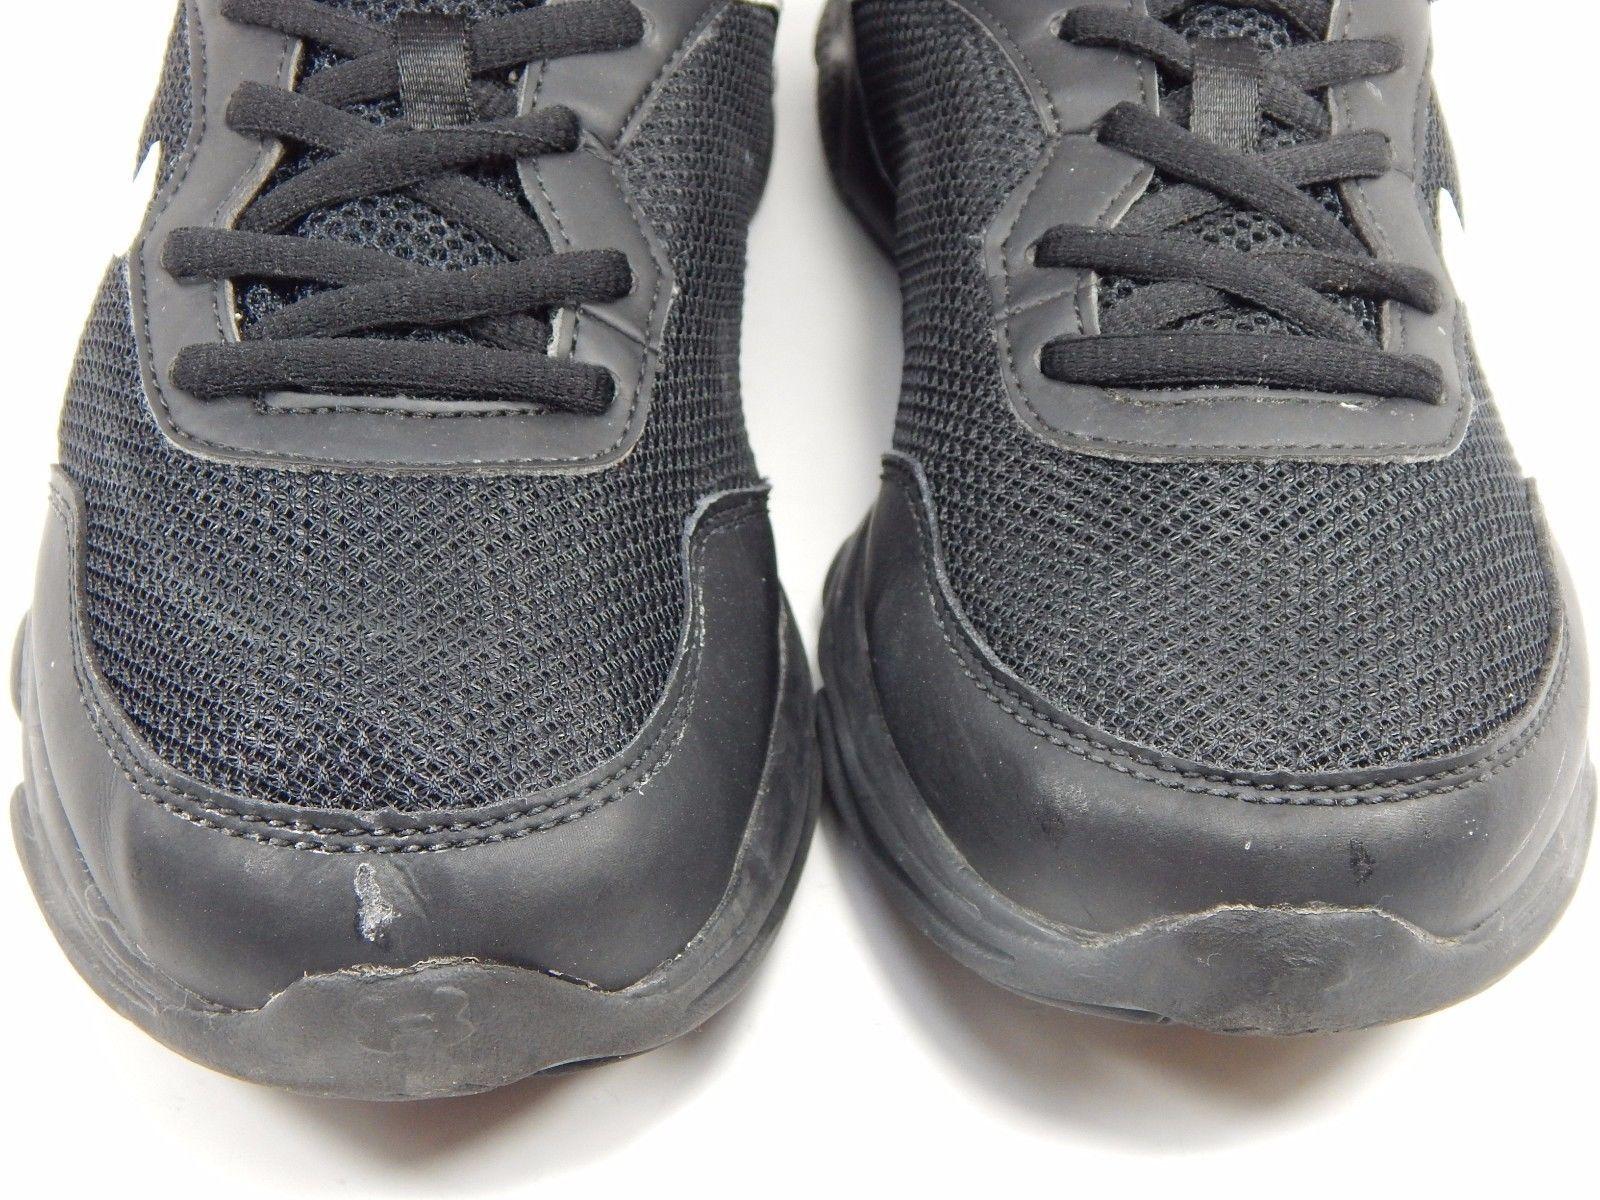 Under Armour Escape Run Boy's Youth Athletic Shoes Size 6.5 Y (M) EU 39 Black